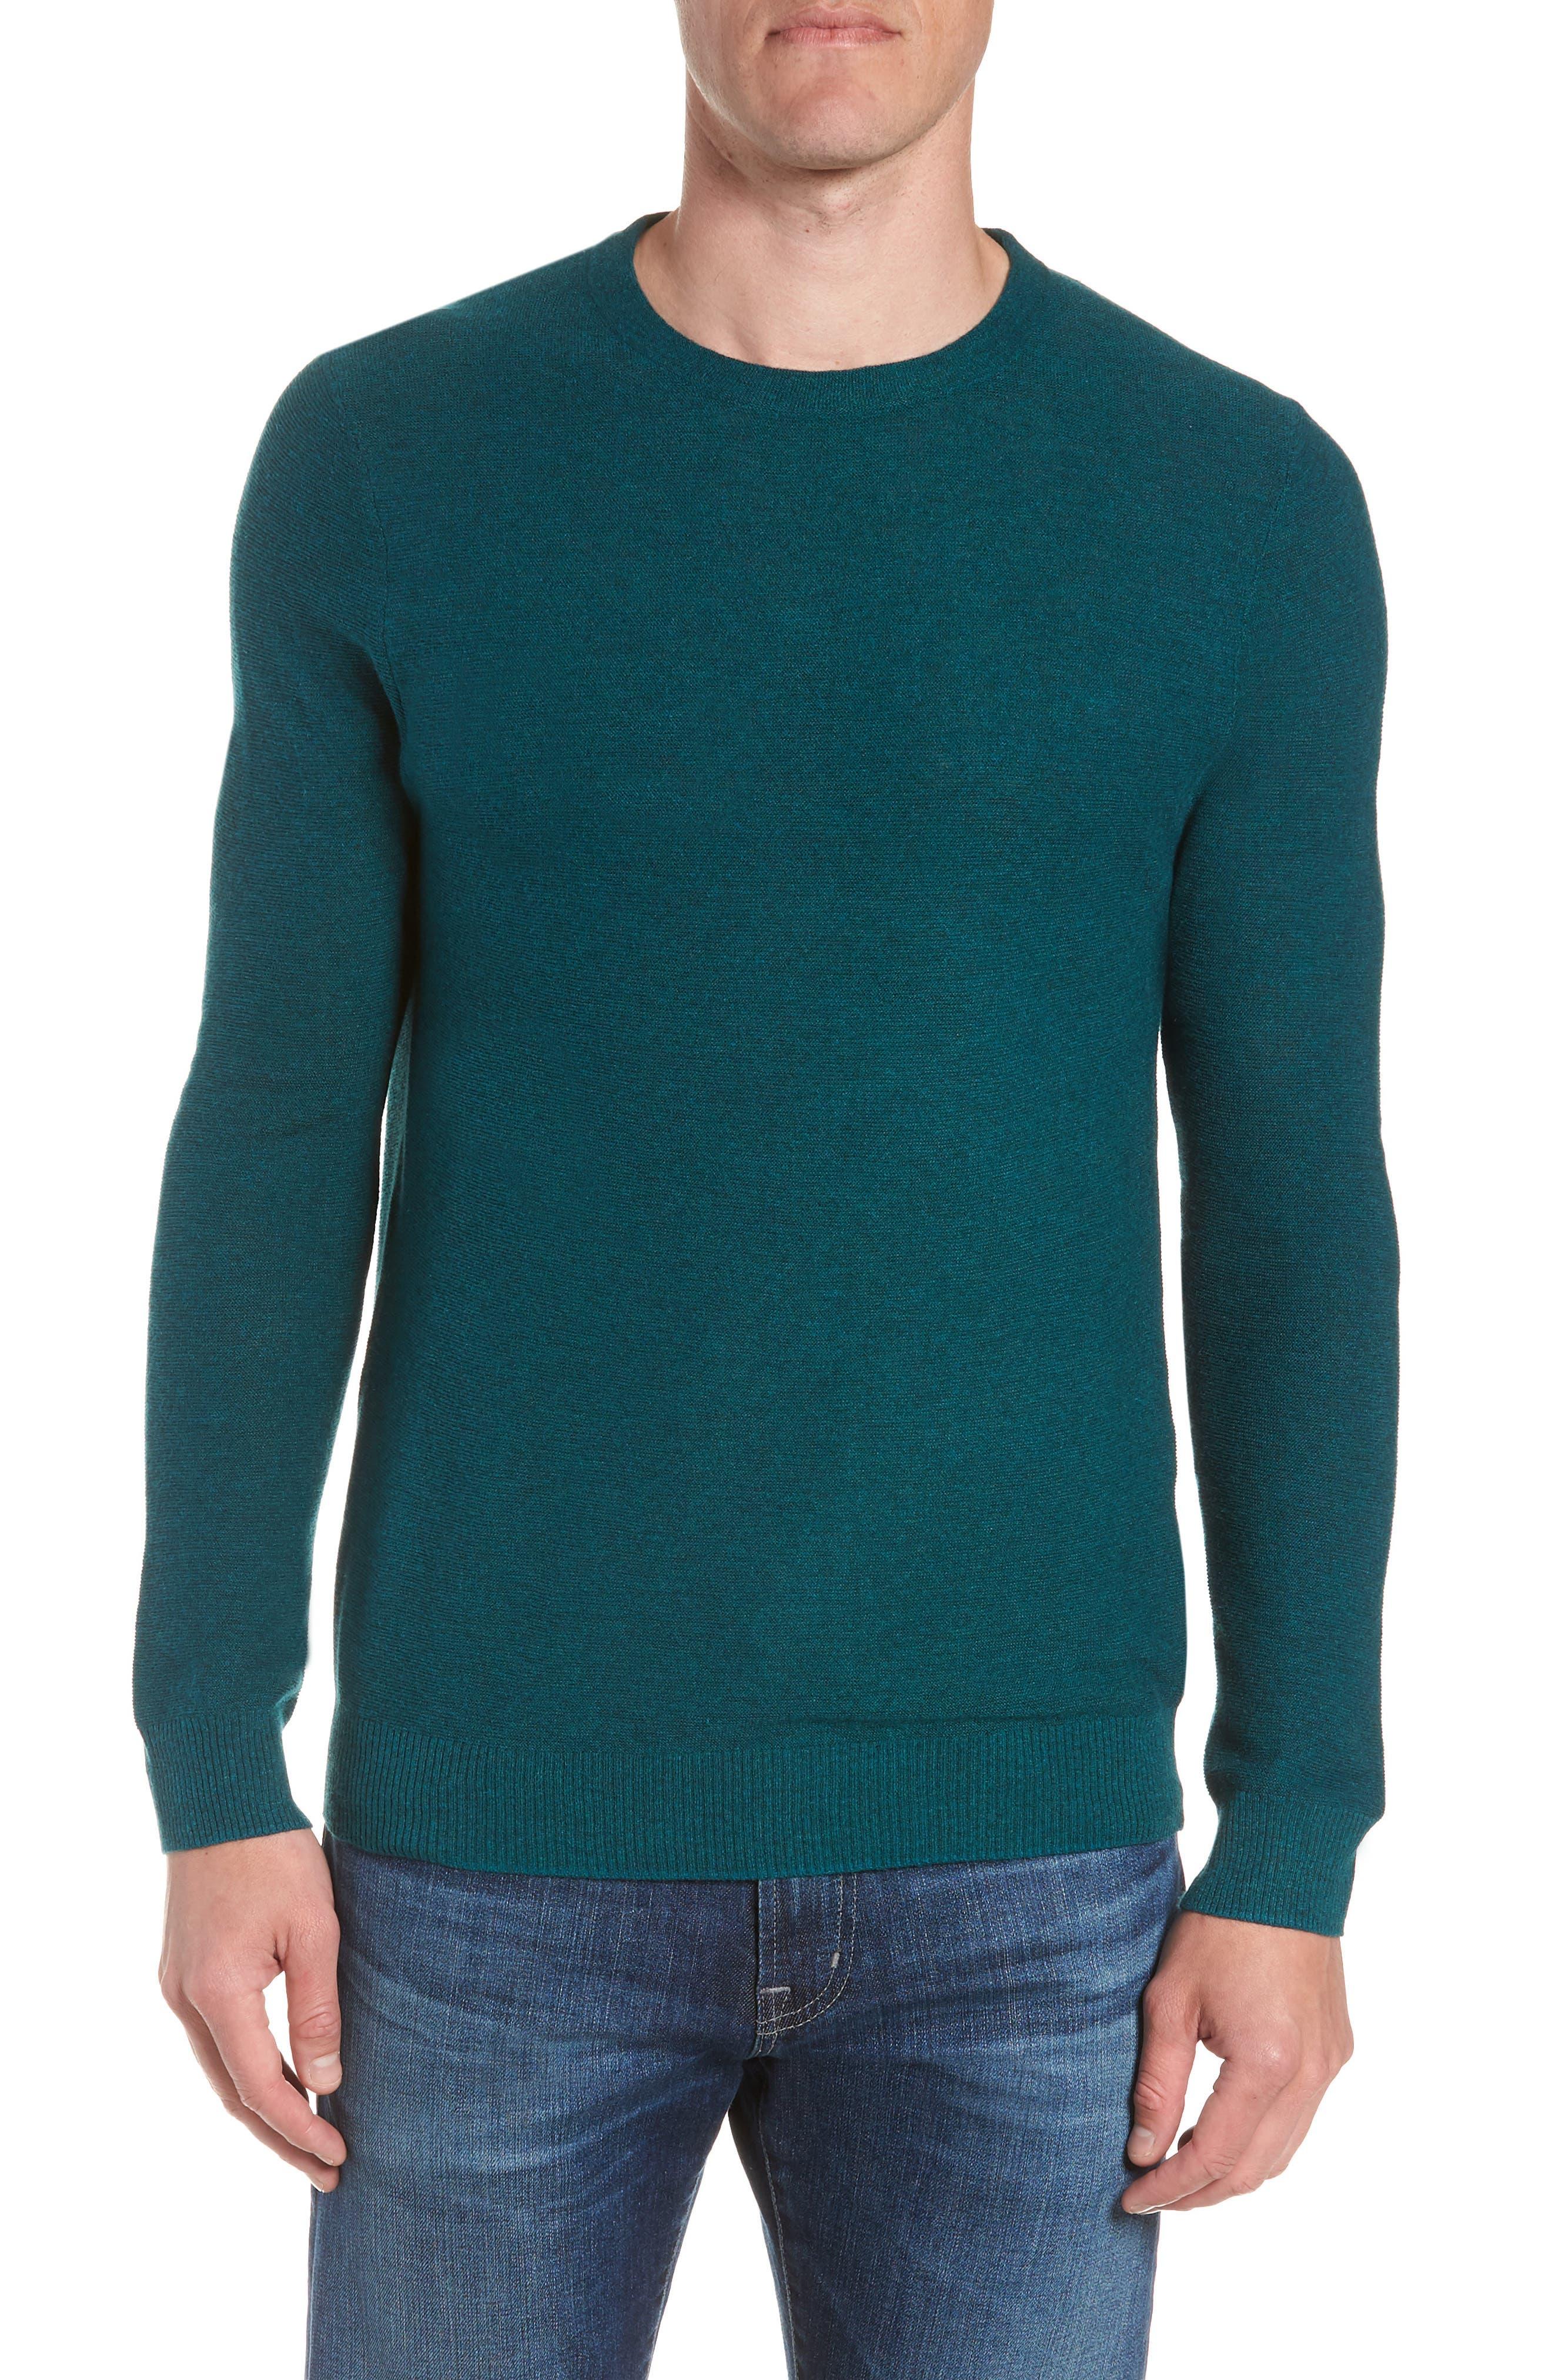 Slim Fit Crewneck Sweater,                             Main thumbnail 1, color,                             Heather Peacock